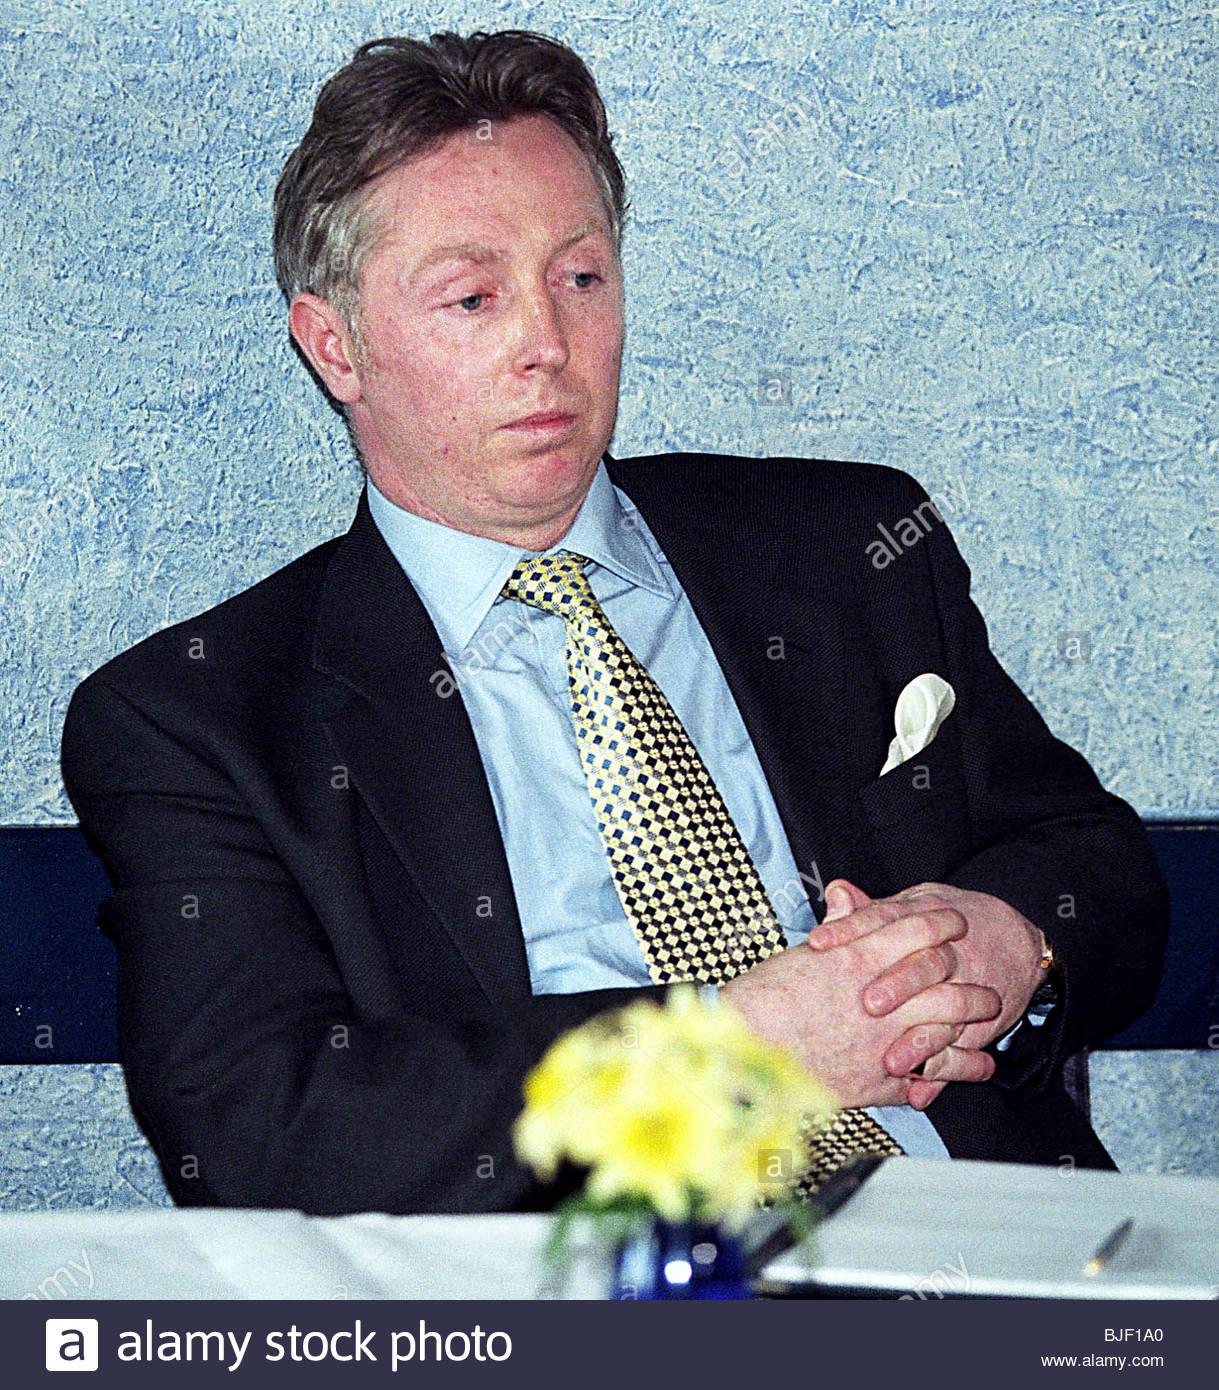 SEASON 1997/1998 Clydebank Financial consultant David Low Stock Photo